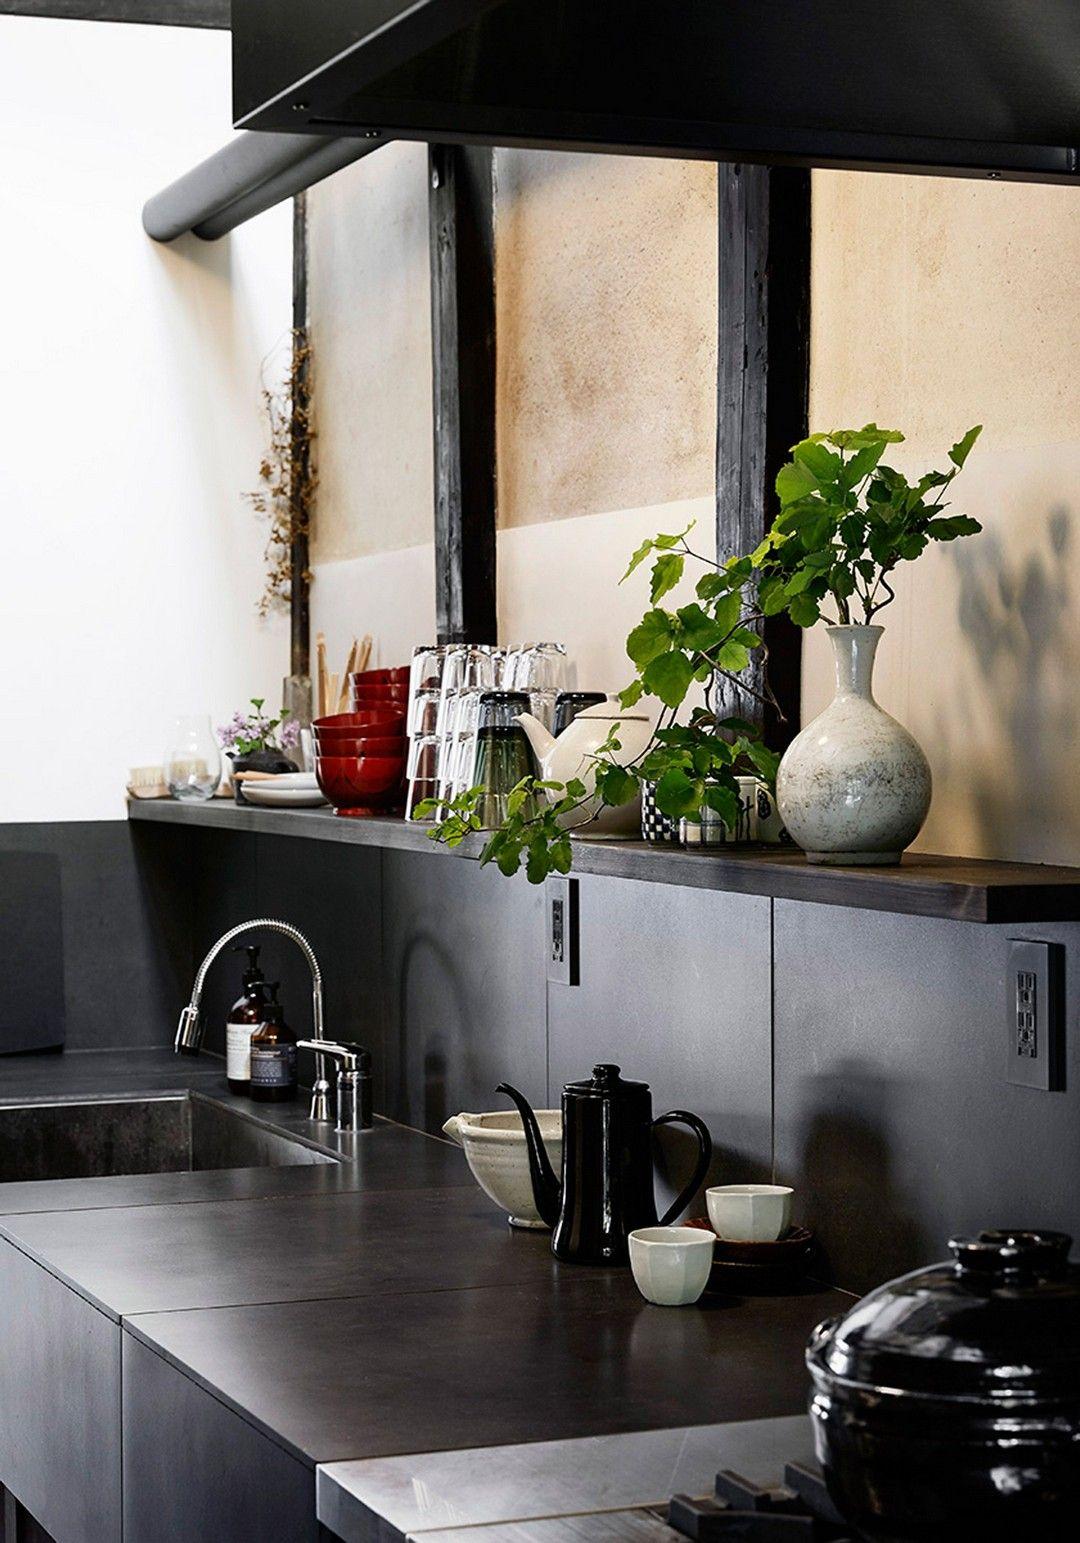 40 magnificence black interior design that are inspiring you interiordesign homedesign homedesignideas